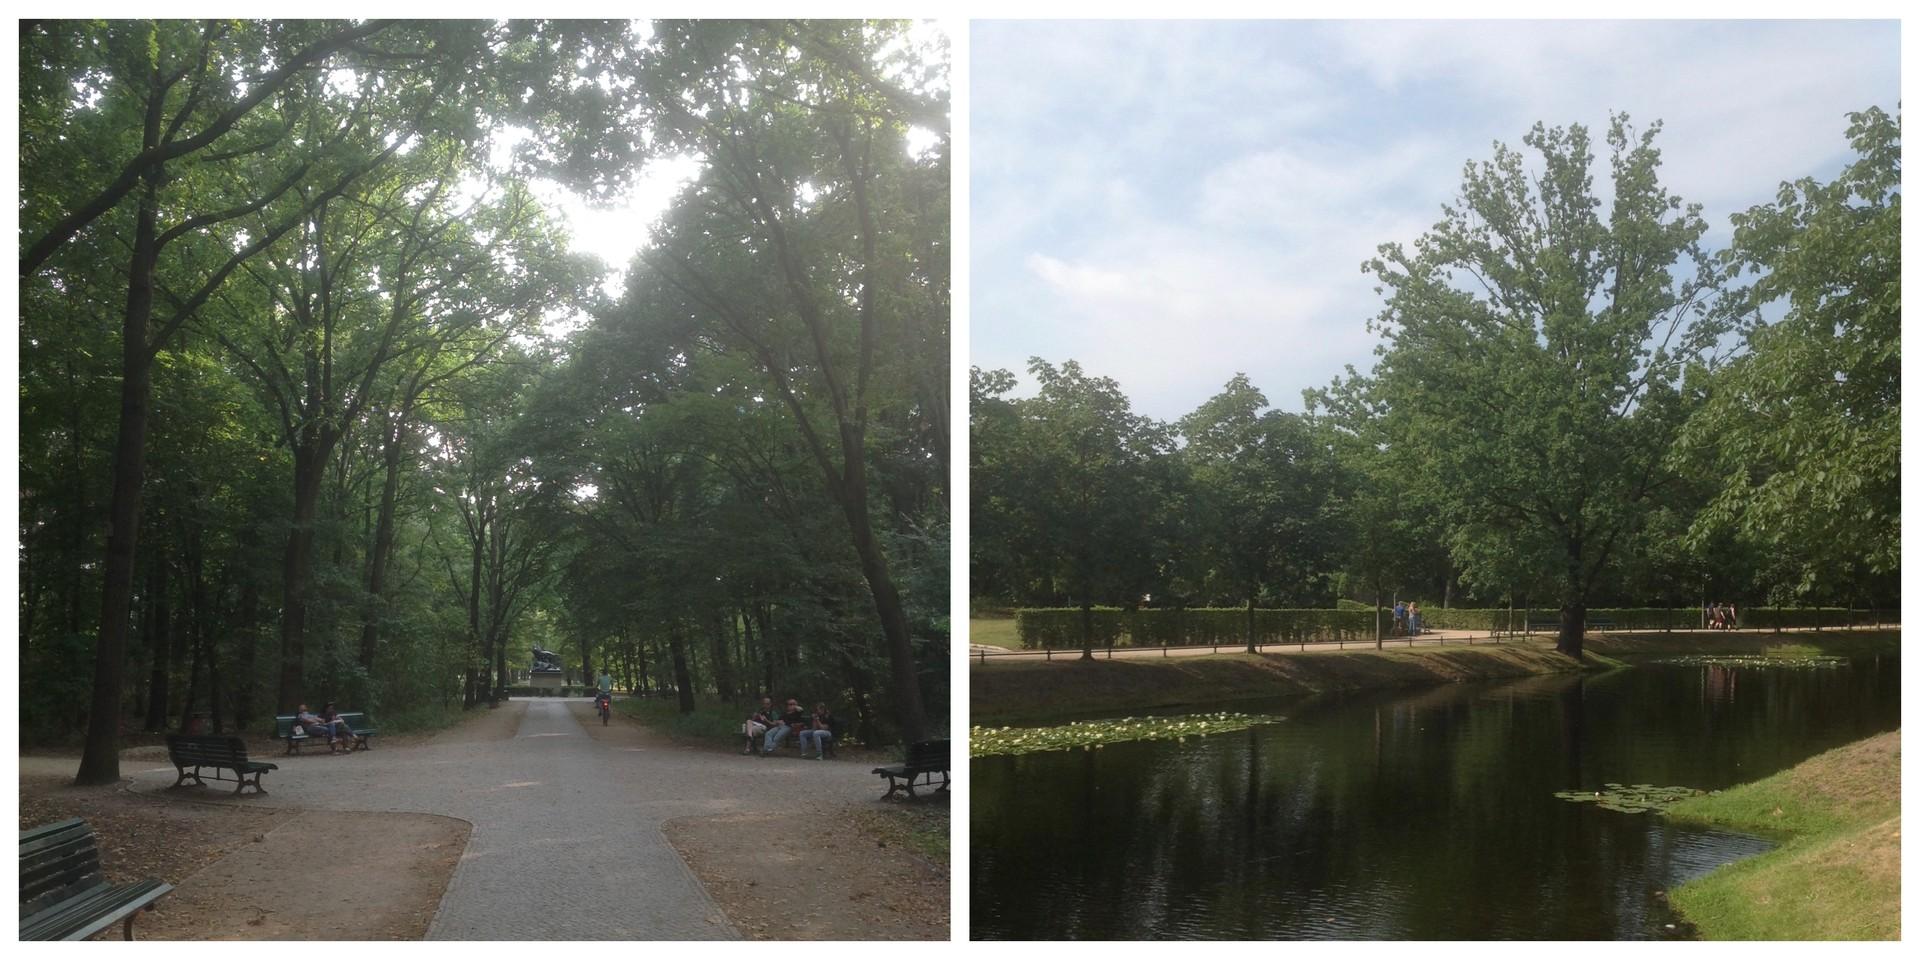 10-things-berlin-summer-fd6cbf3fdbcc7163